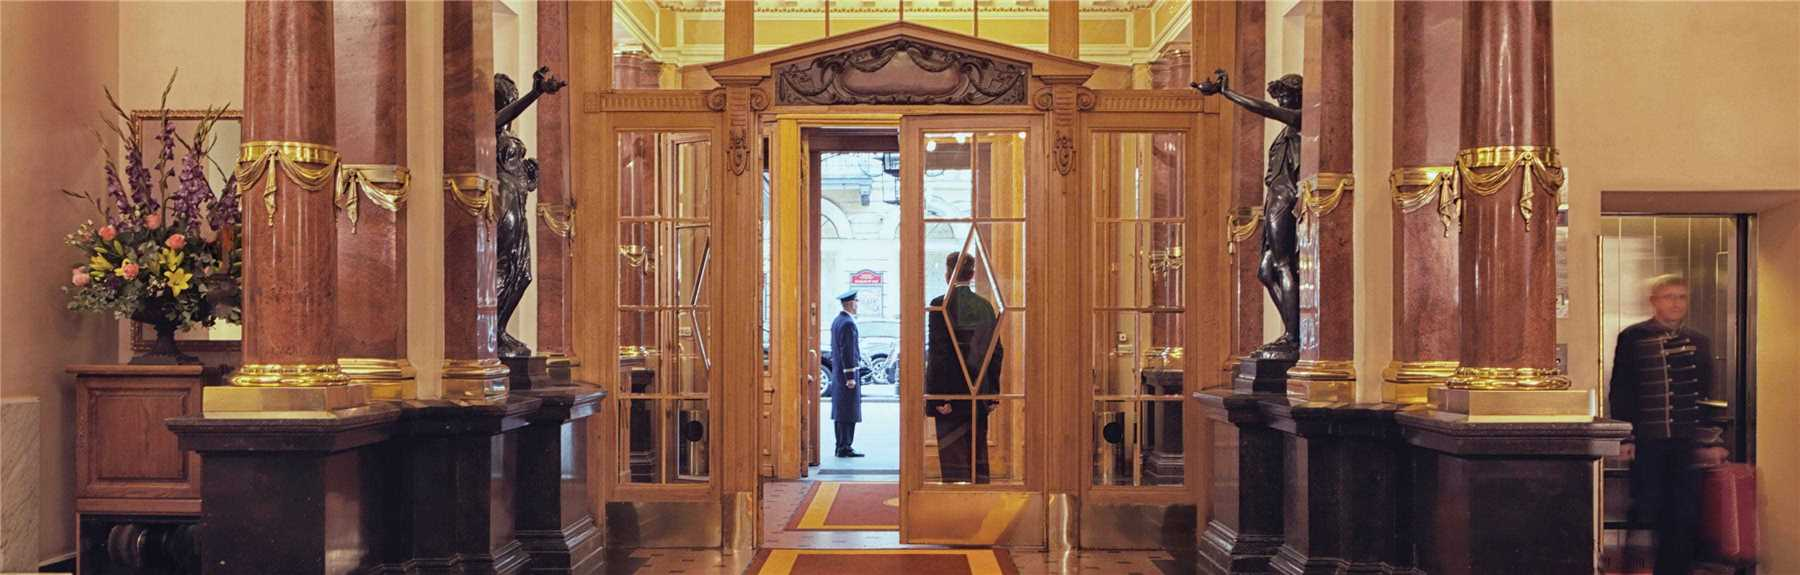 Belmond Grand Hotel Europe Eingang